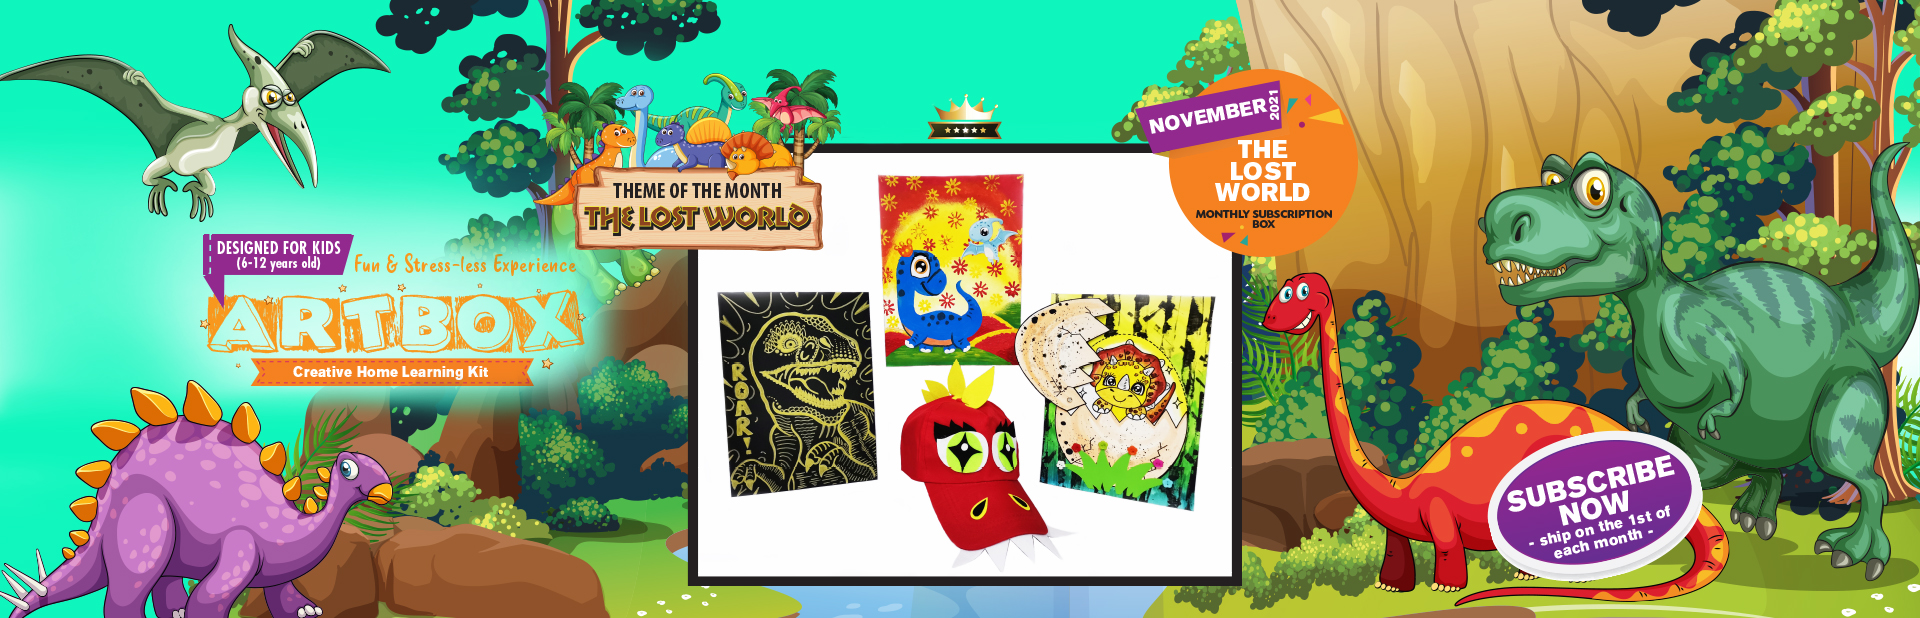 web-banner-nov-the-lost-world